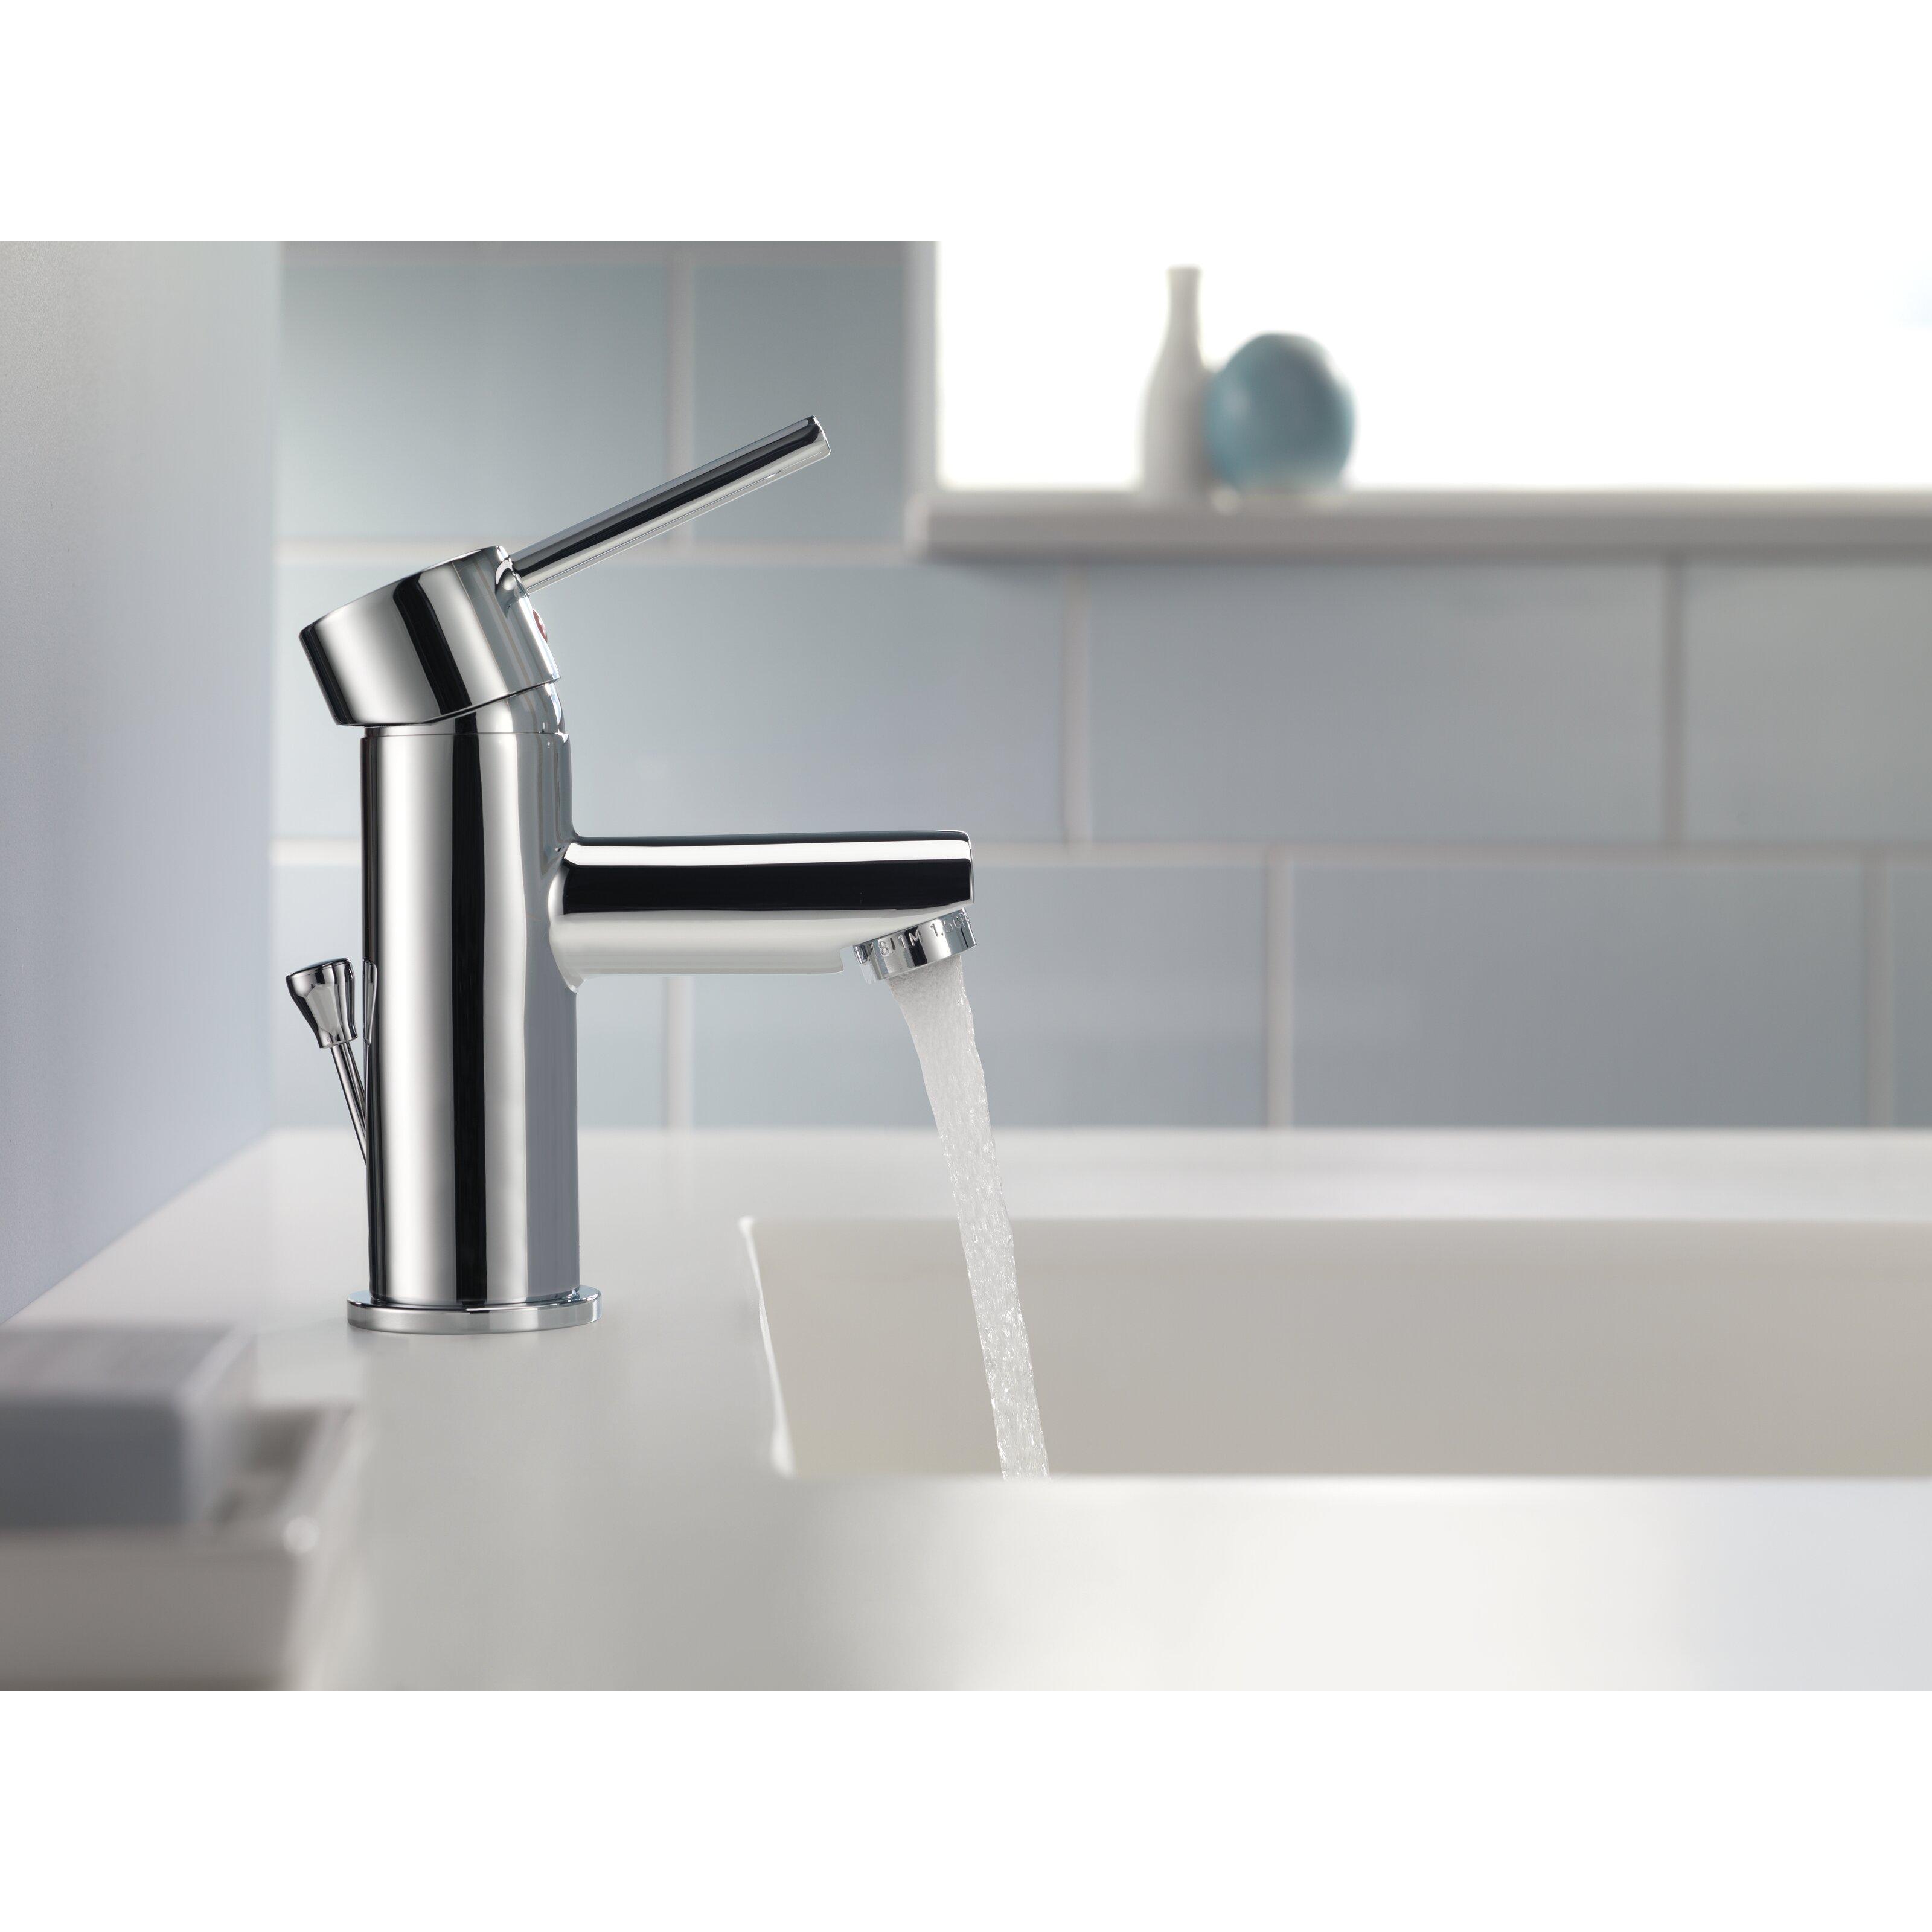 Delta trinsic bathroom single handle single hole lavatory for Delta trinsic bathroom sink faucet